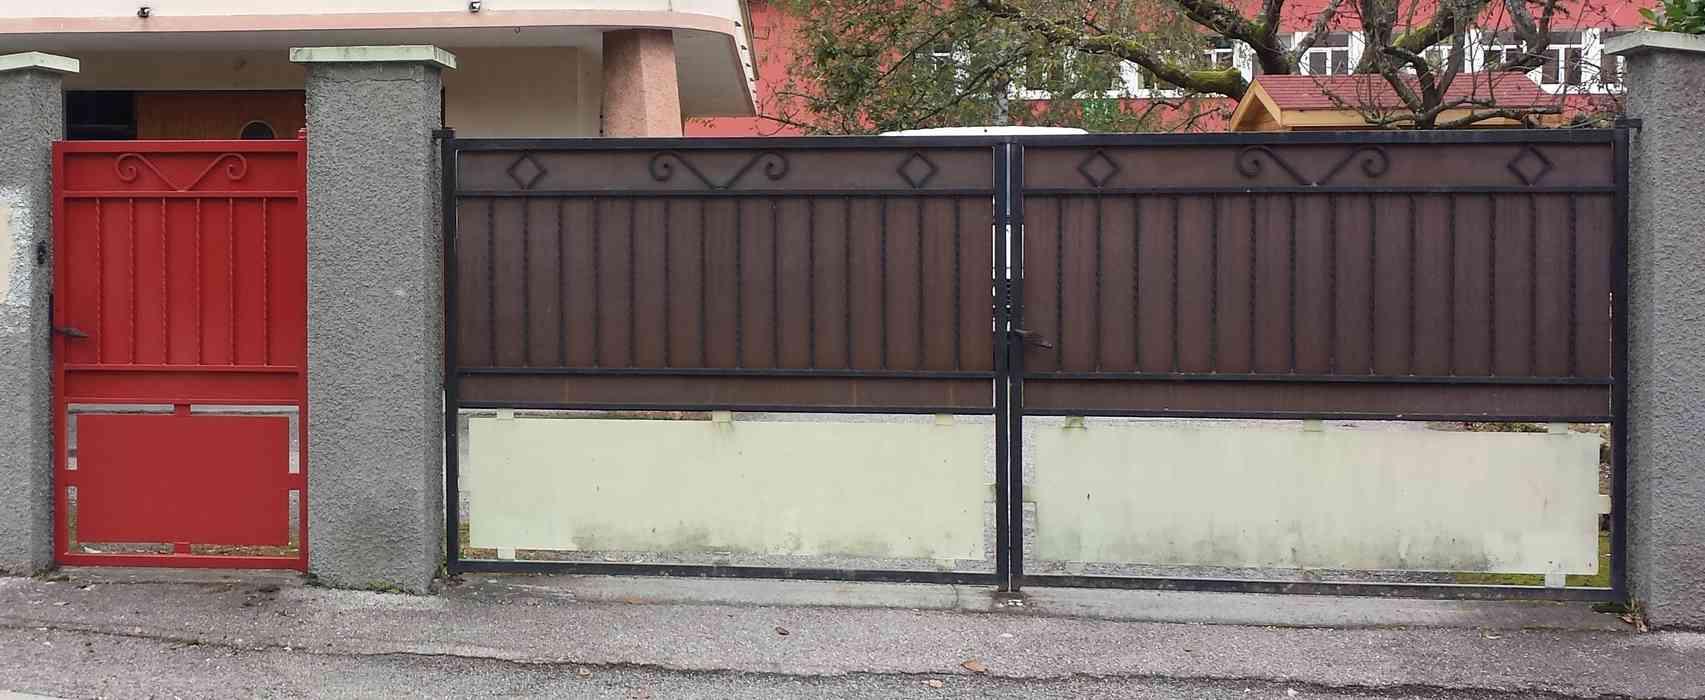 vizille-portail-peinture-renovation